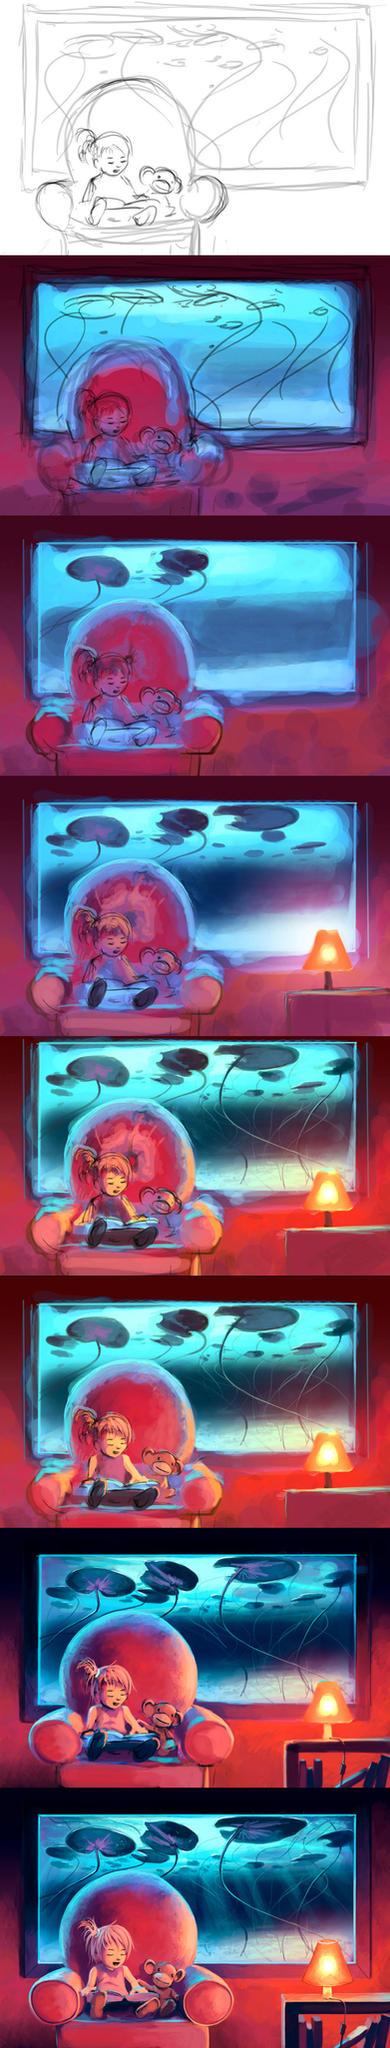 WIP Lily's Island by AquaSixio